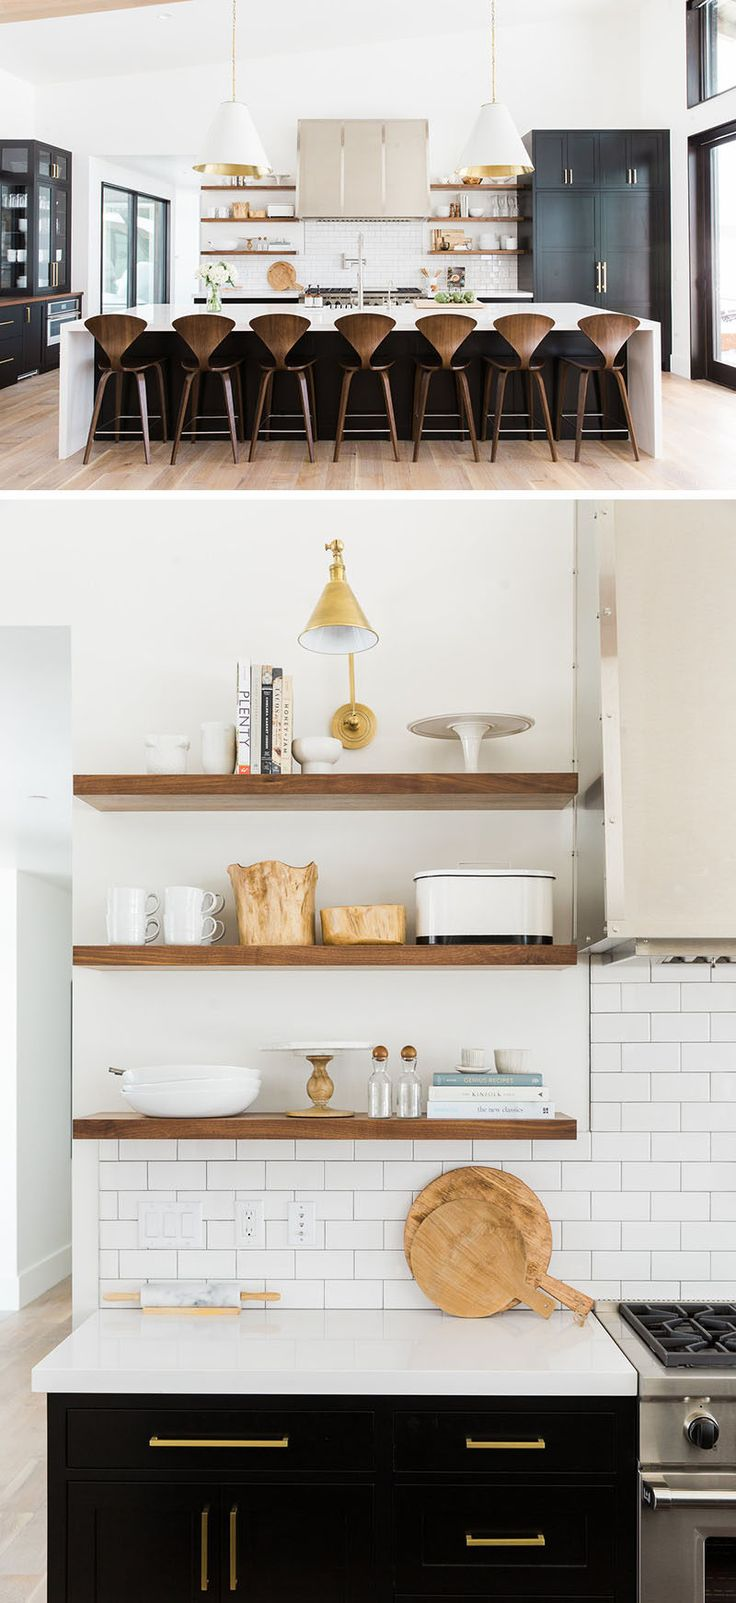 kitchen design idea 19 examples of open shelving kitchen design open kitchen design on kitchen decor open shelves id=60207